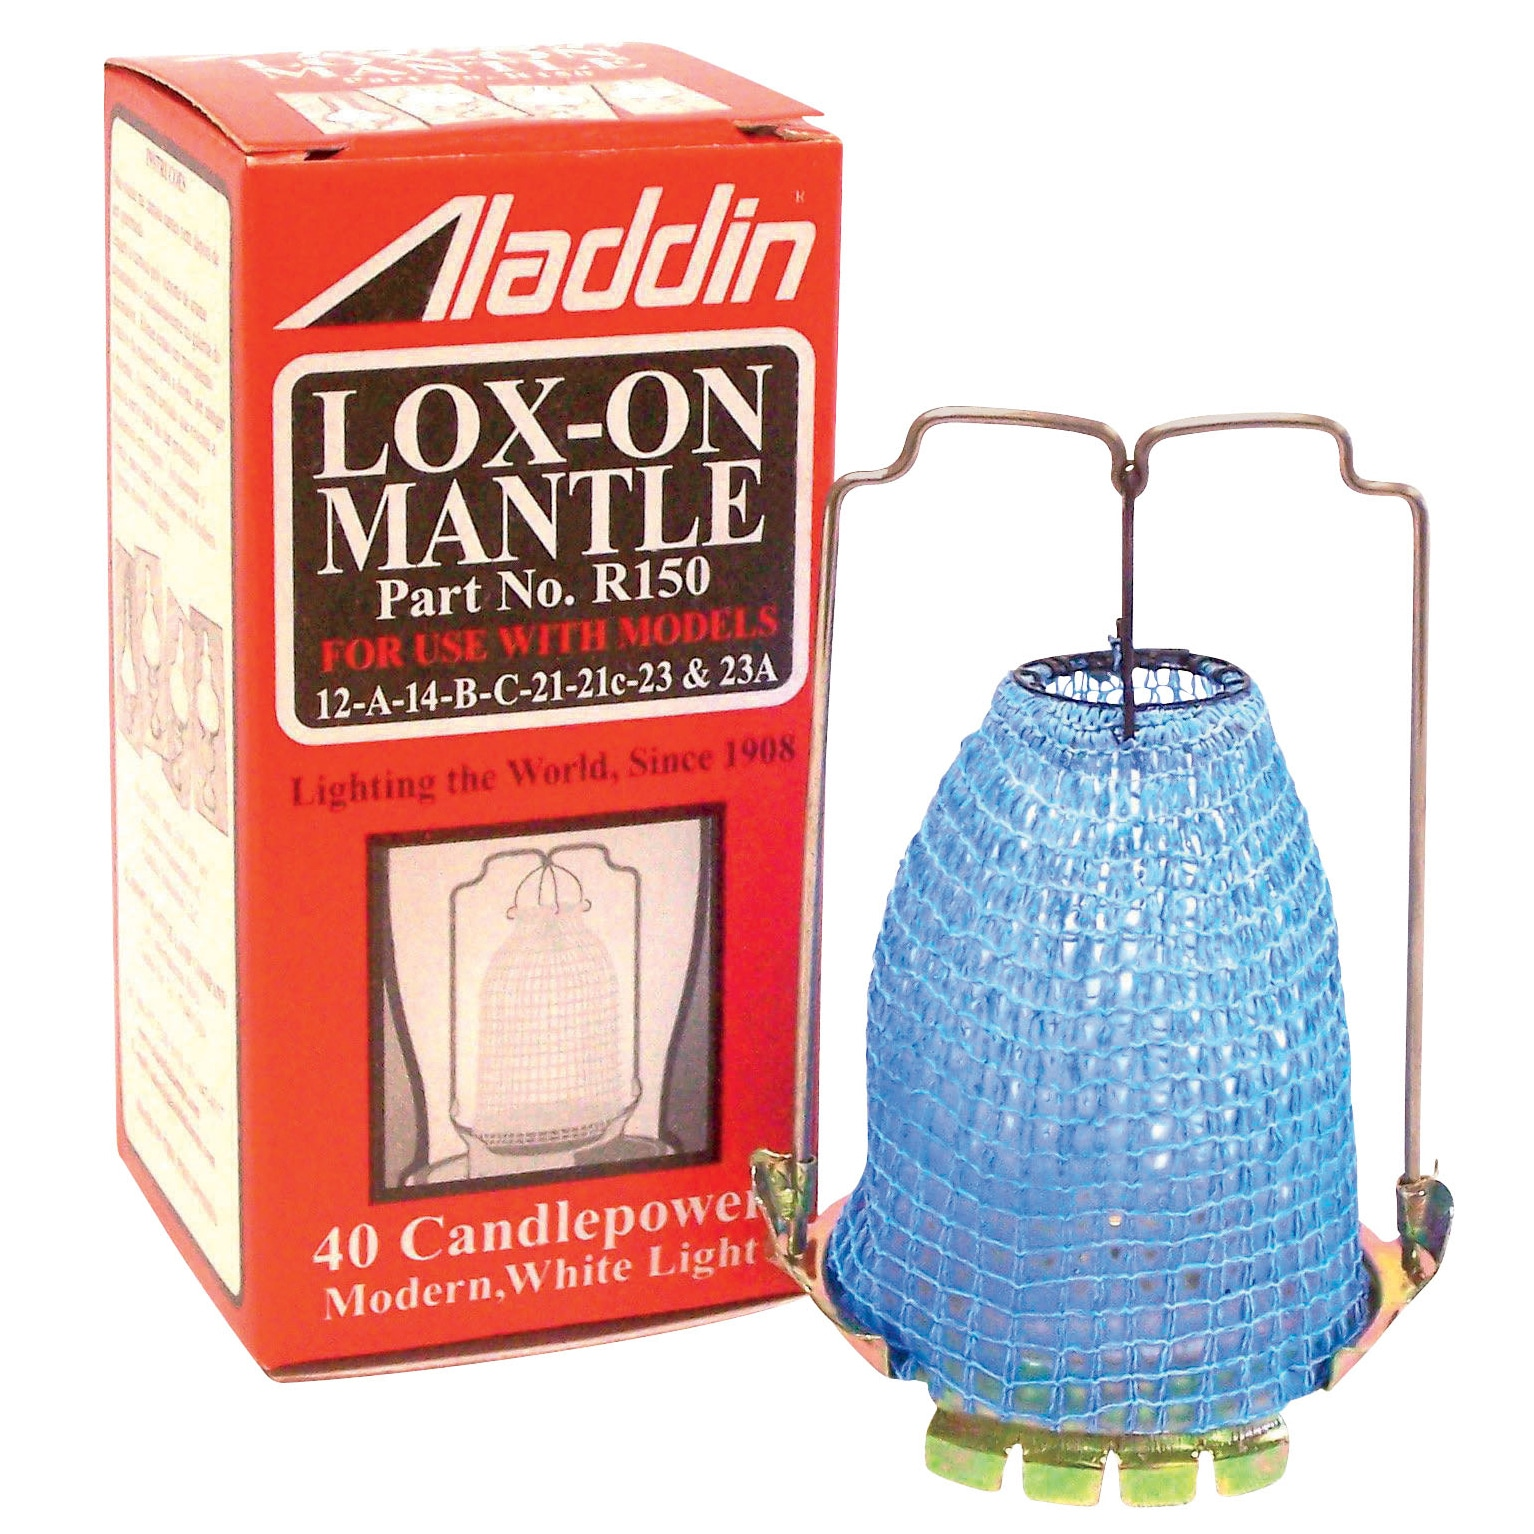 Brands Aladdin Lamps R-150 Mantles (Mantles Lox-on), Blue...